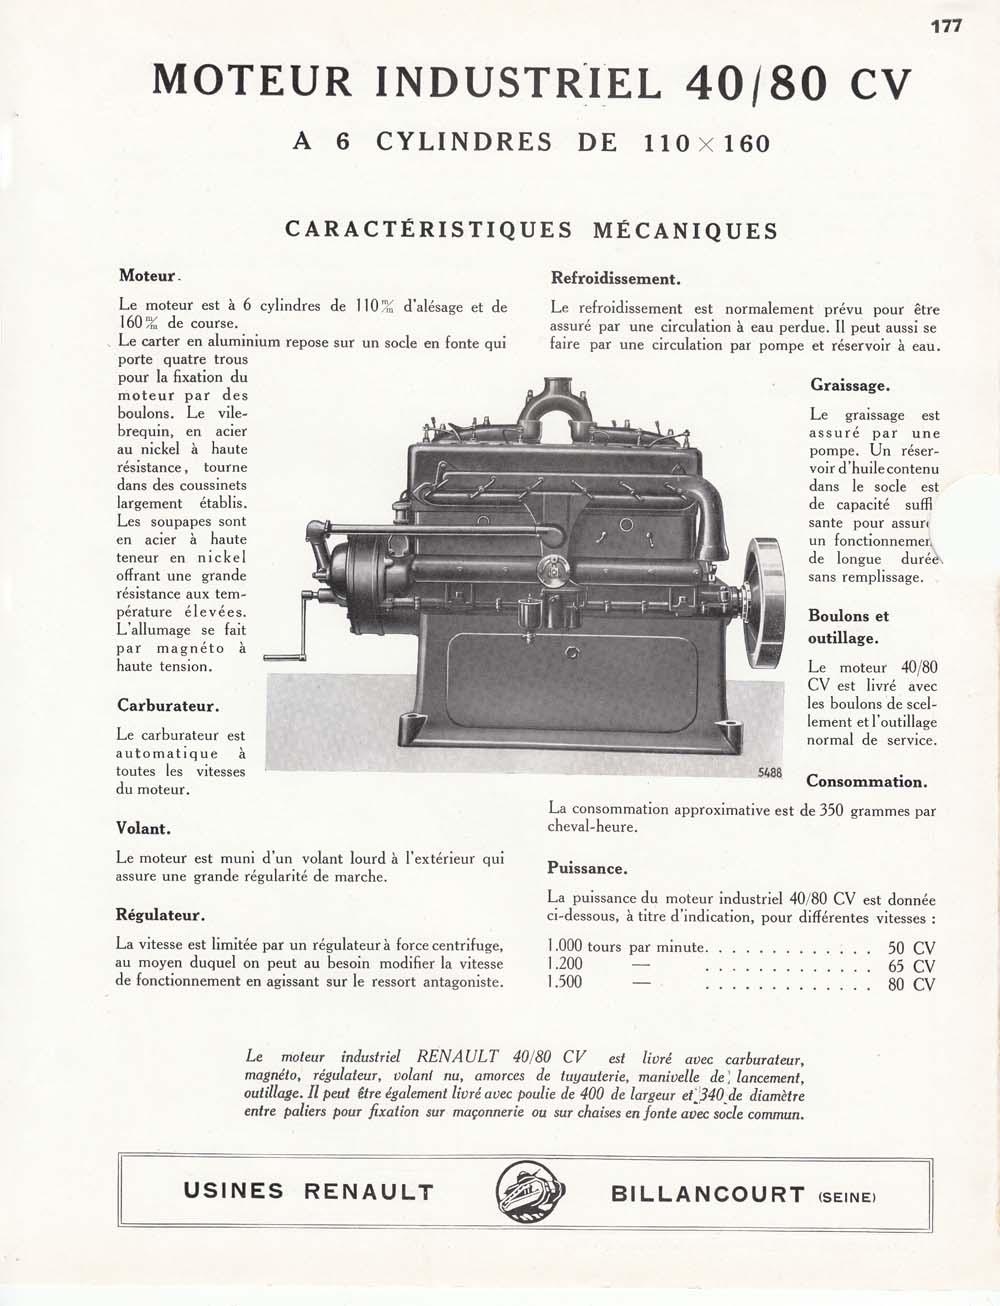 moteur_industriel_40_80cv_6cyl_1